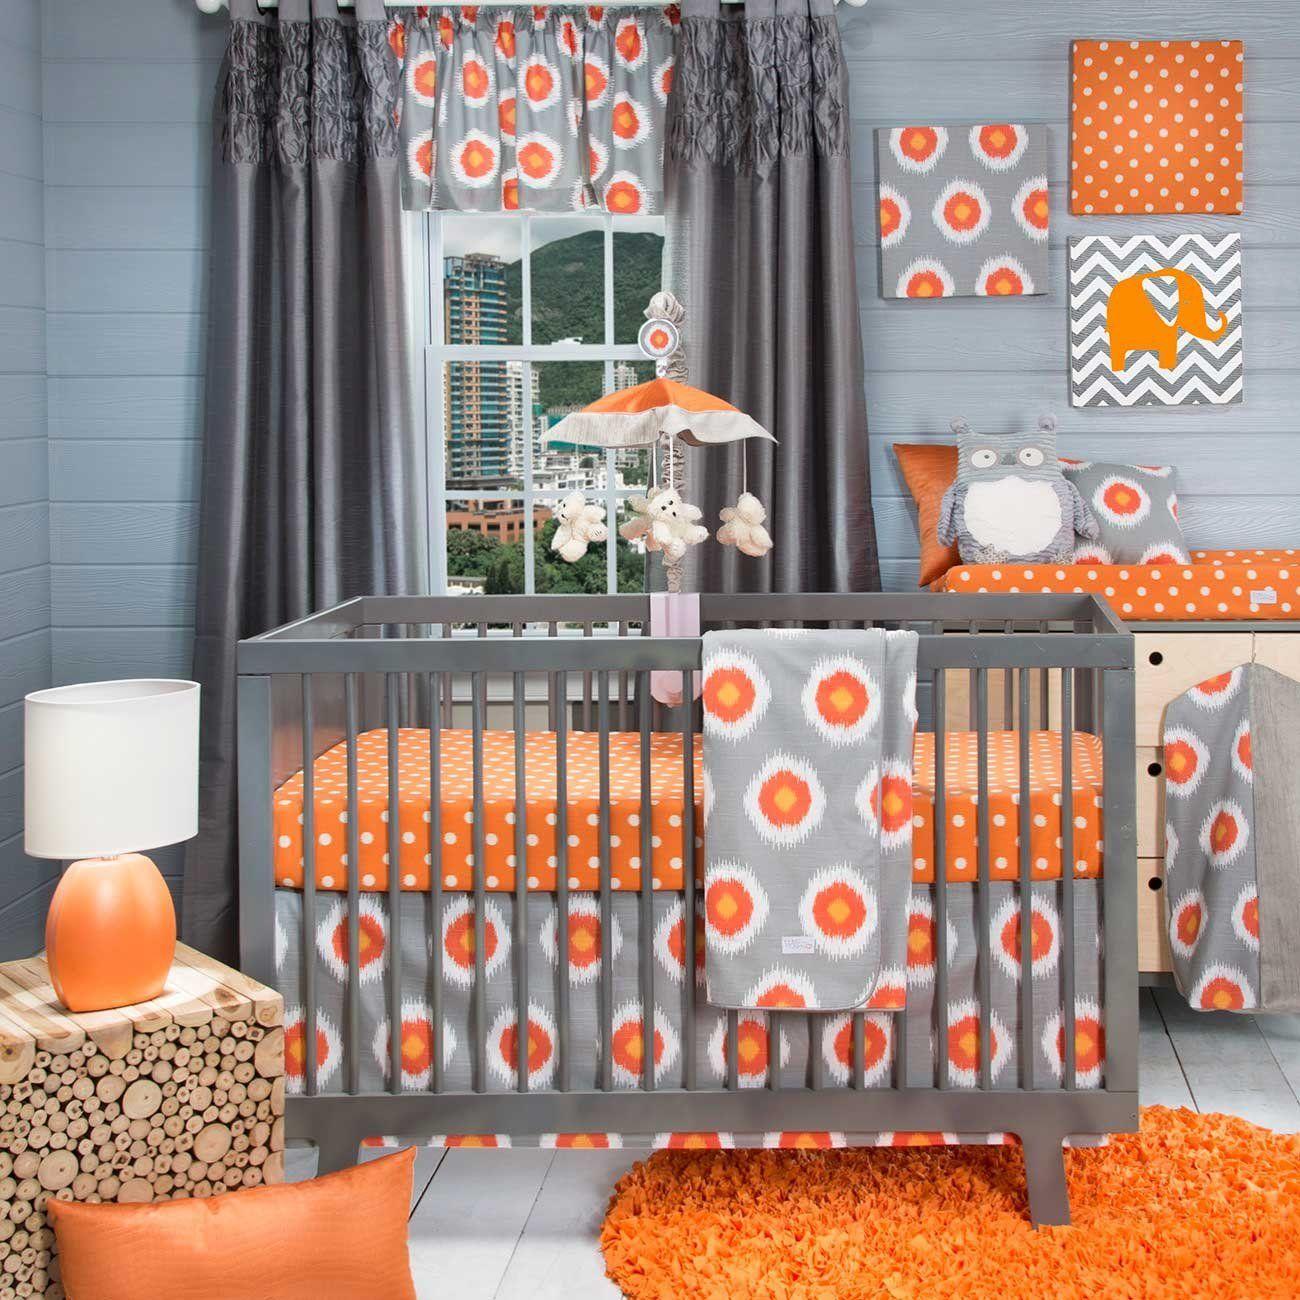 Baby Nursery Unique Baby Nursery Room Decoration With Grey And Crib Bedding Baby Crib Bedding Baby